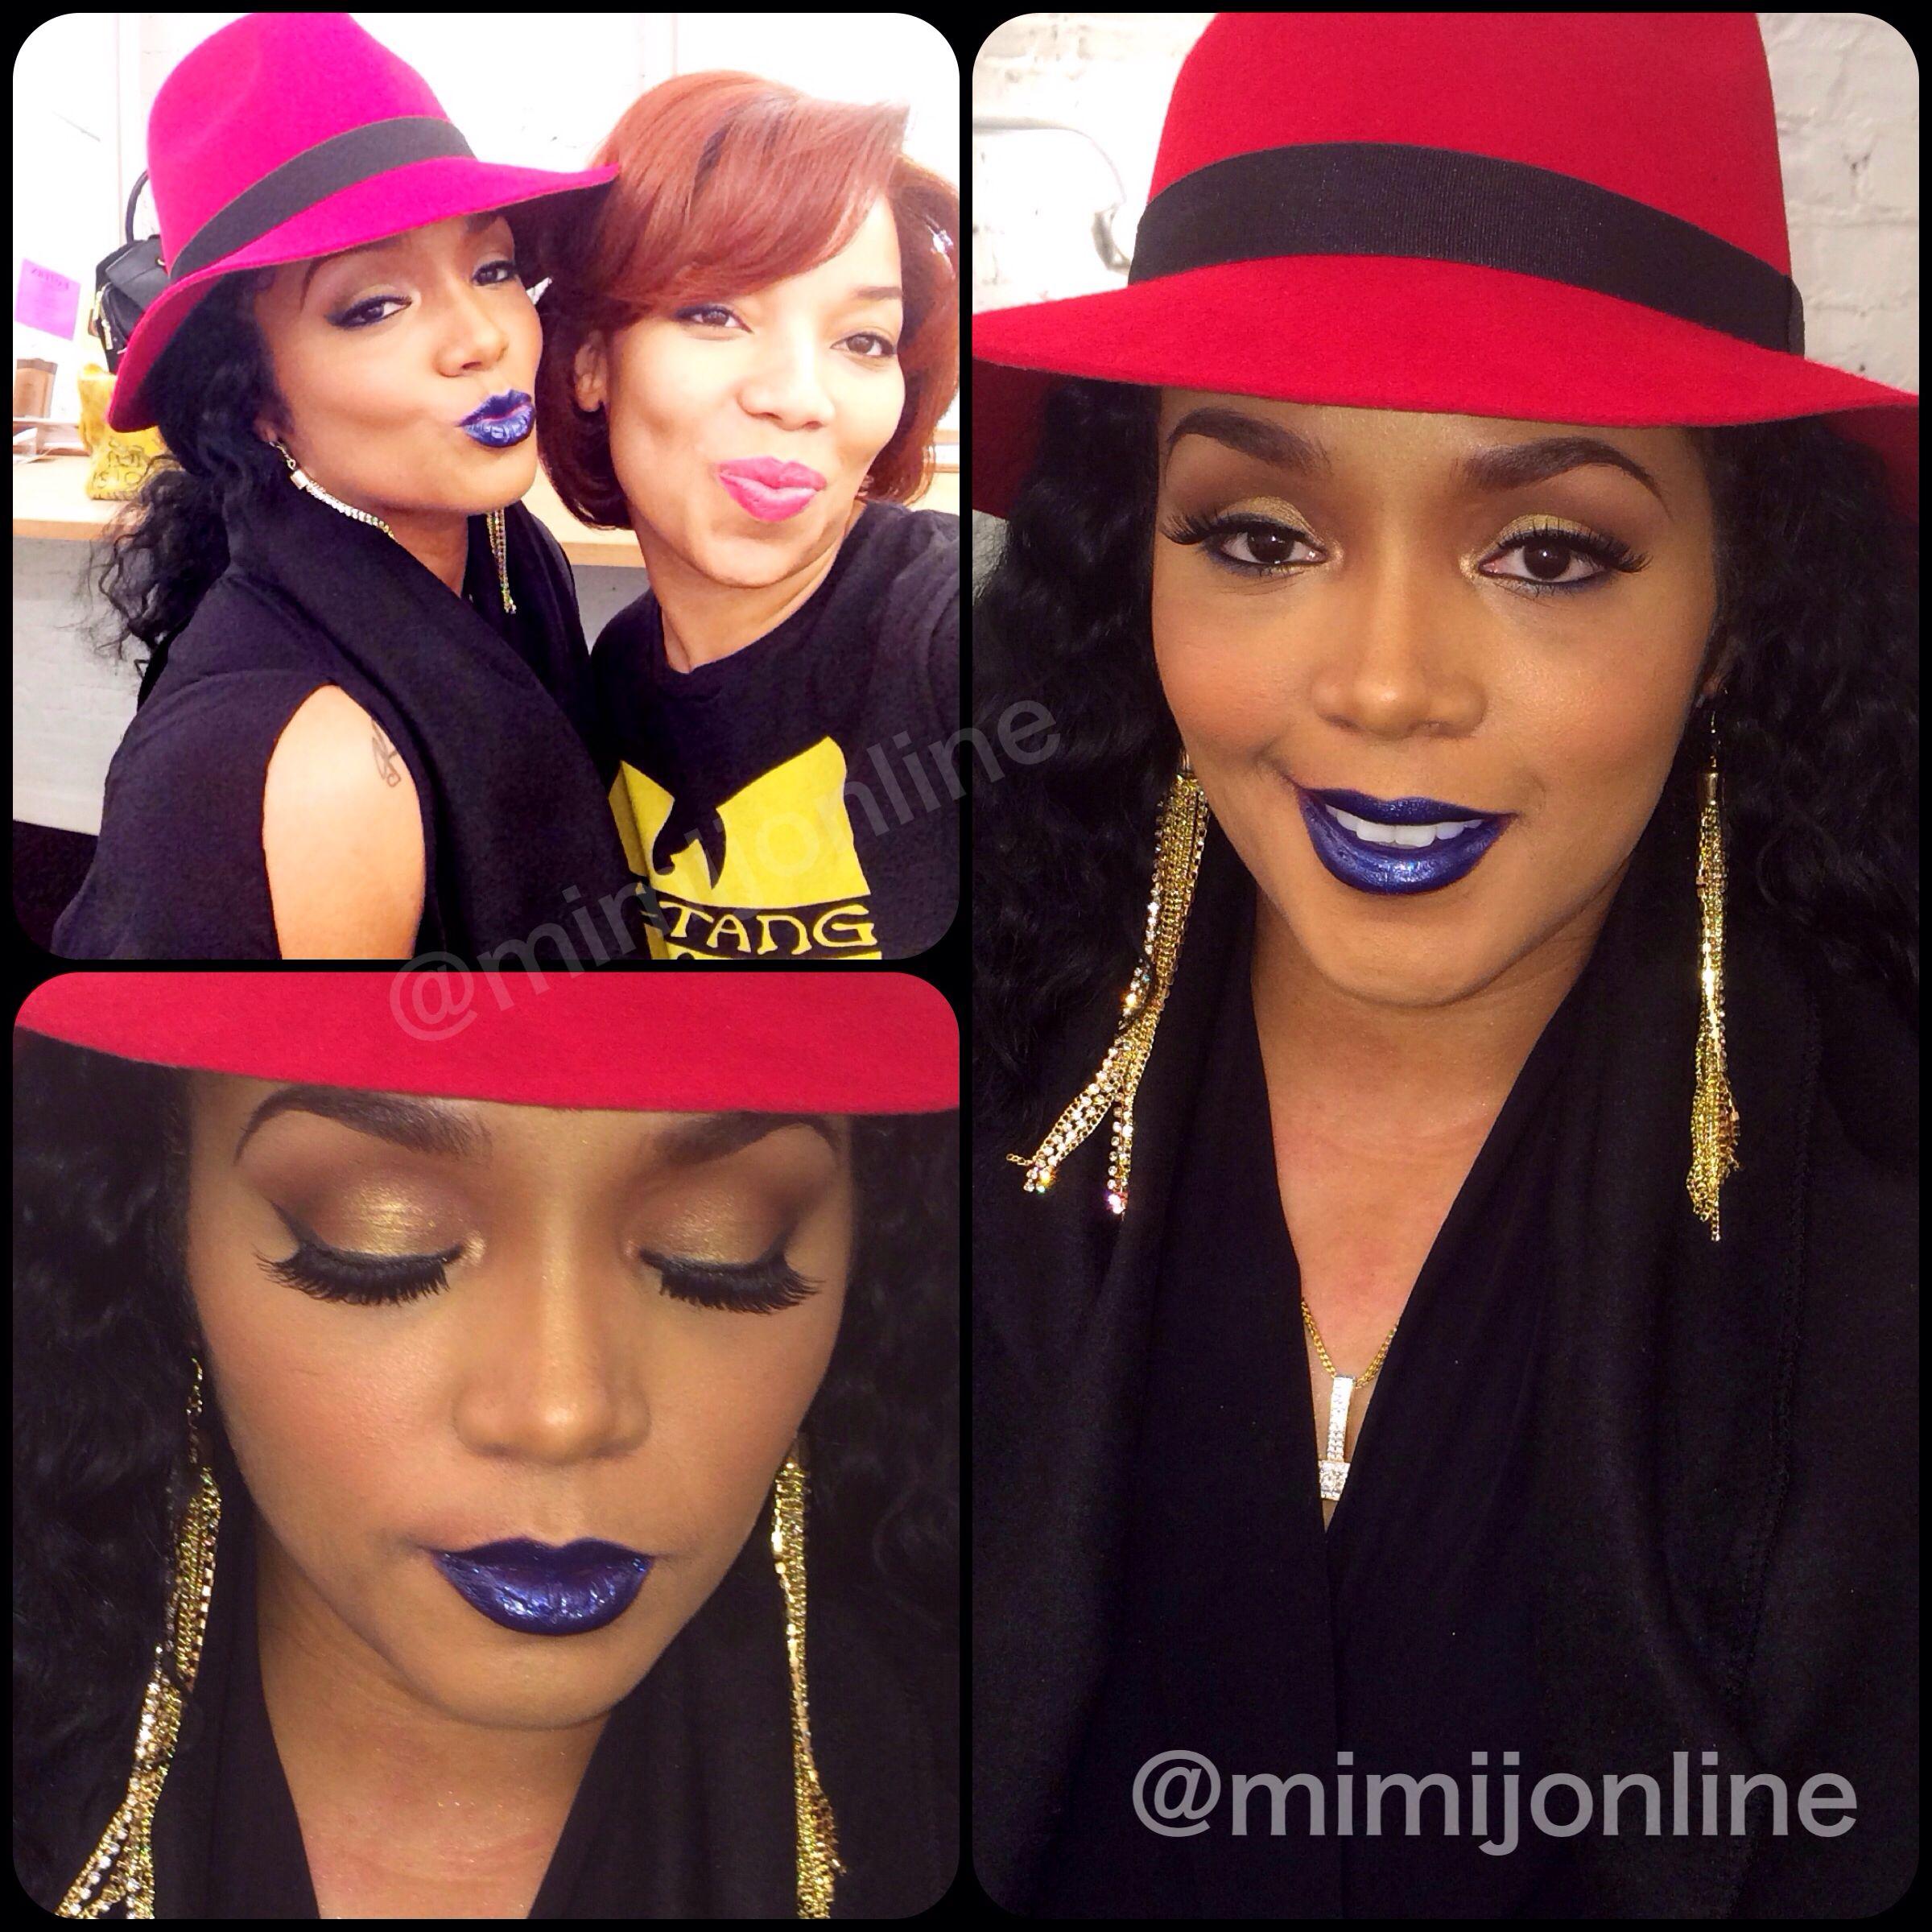 Rasheeda Frost and makeup artist Mimi J Celeb/TV makeup